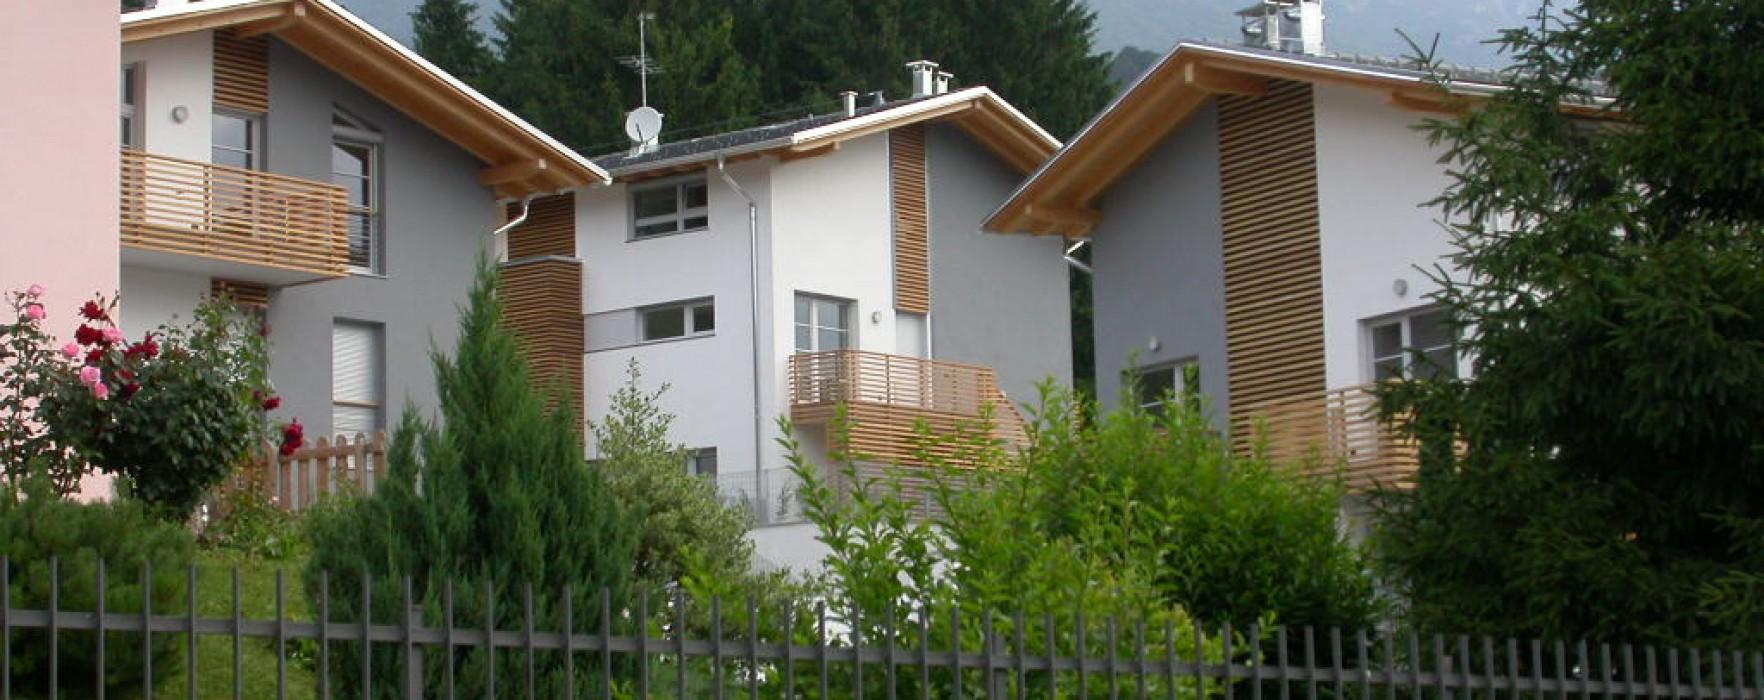 RESIDENZA GIULIA – Nordhaus